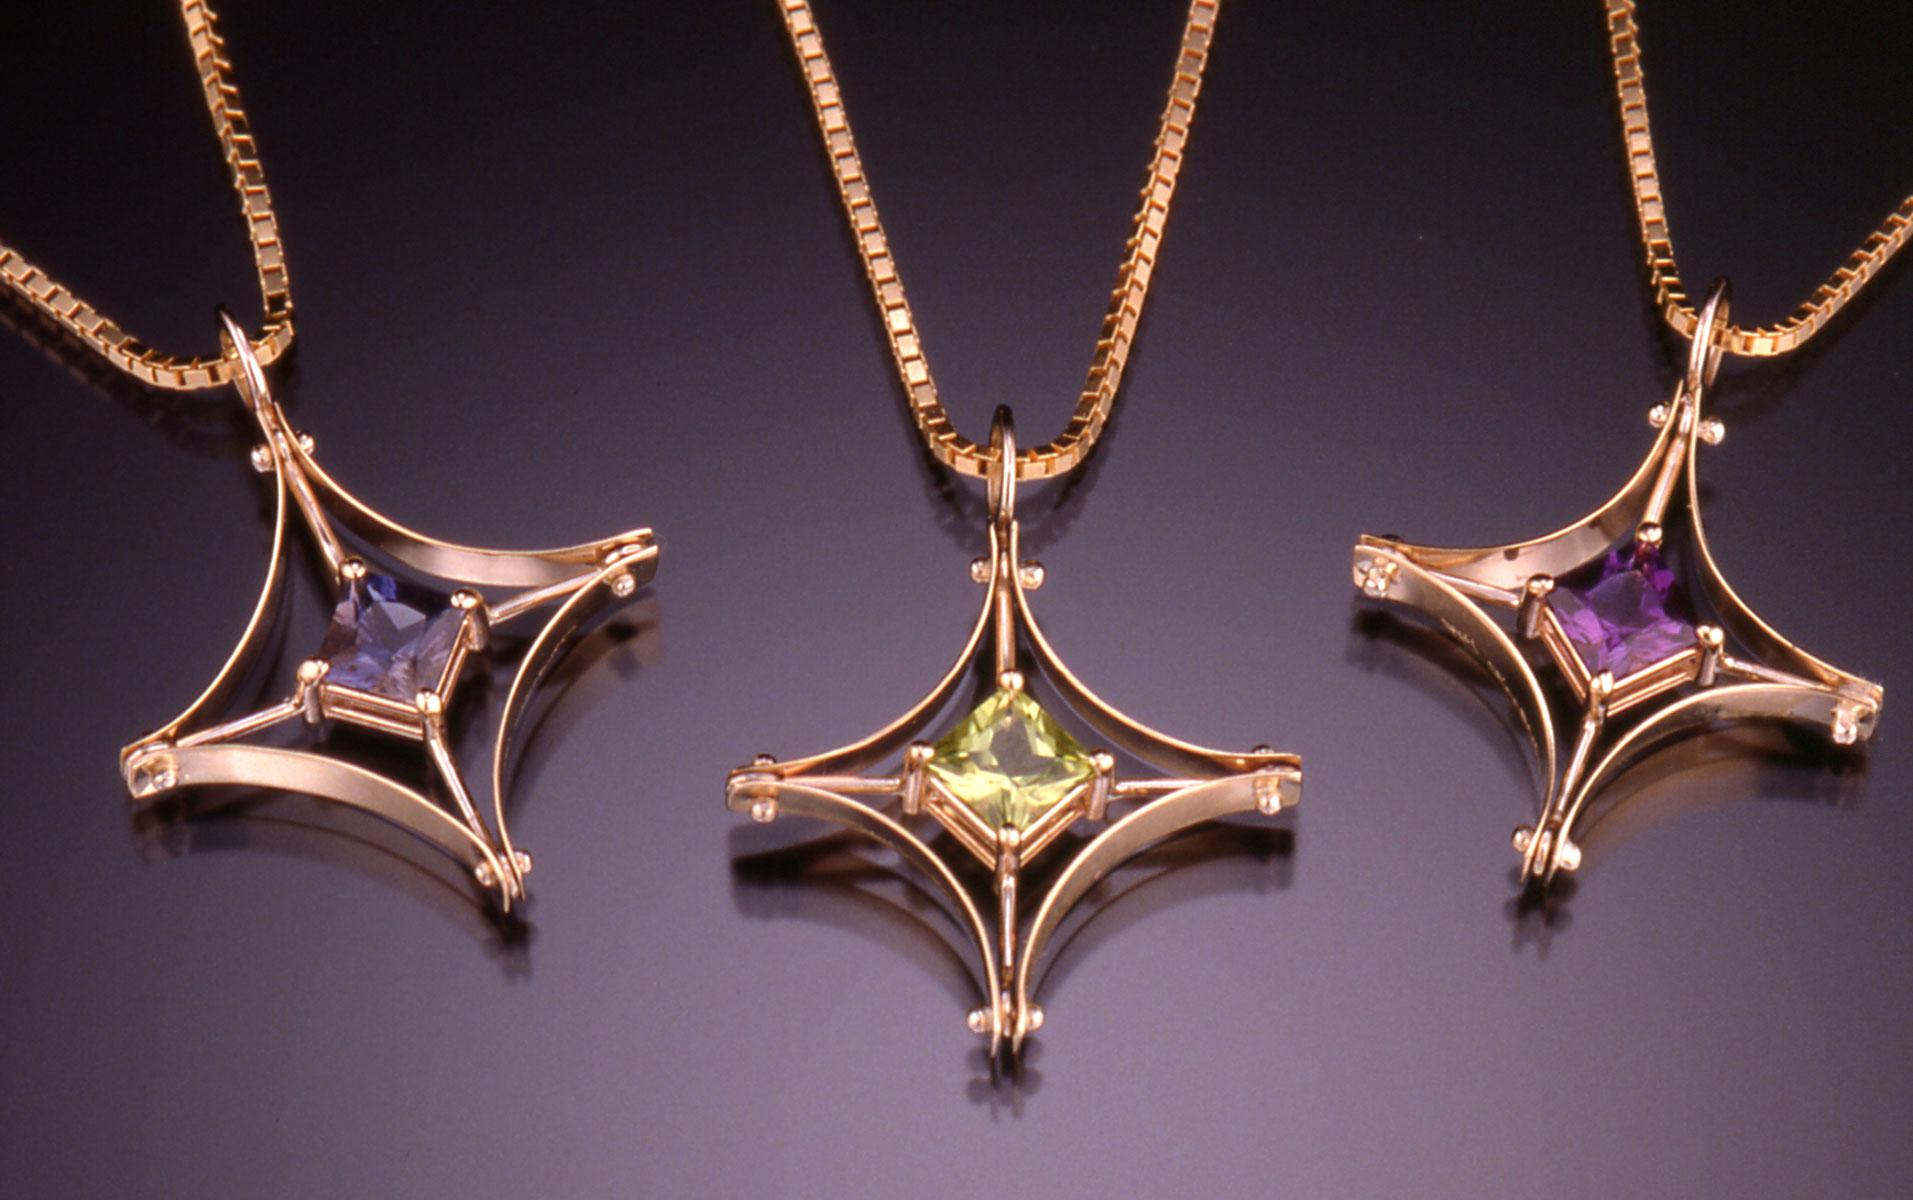 Princess pendants